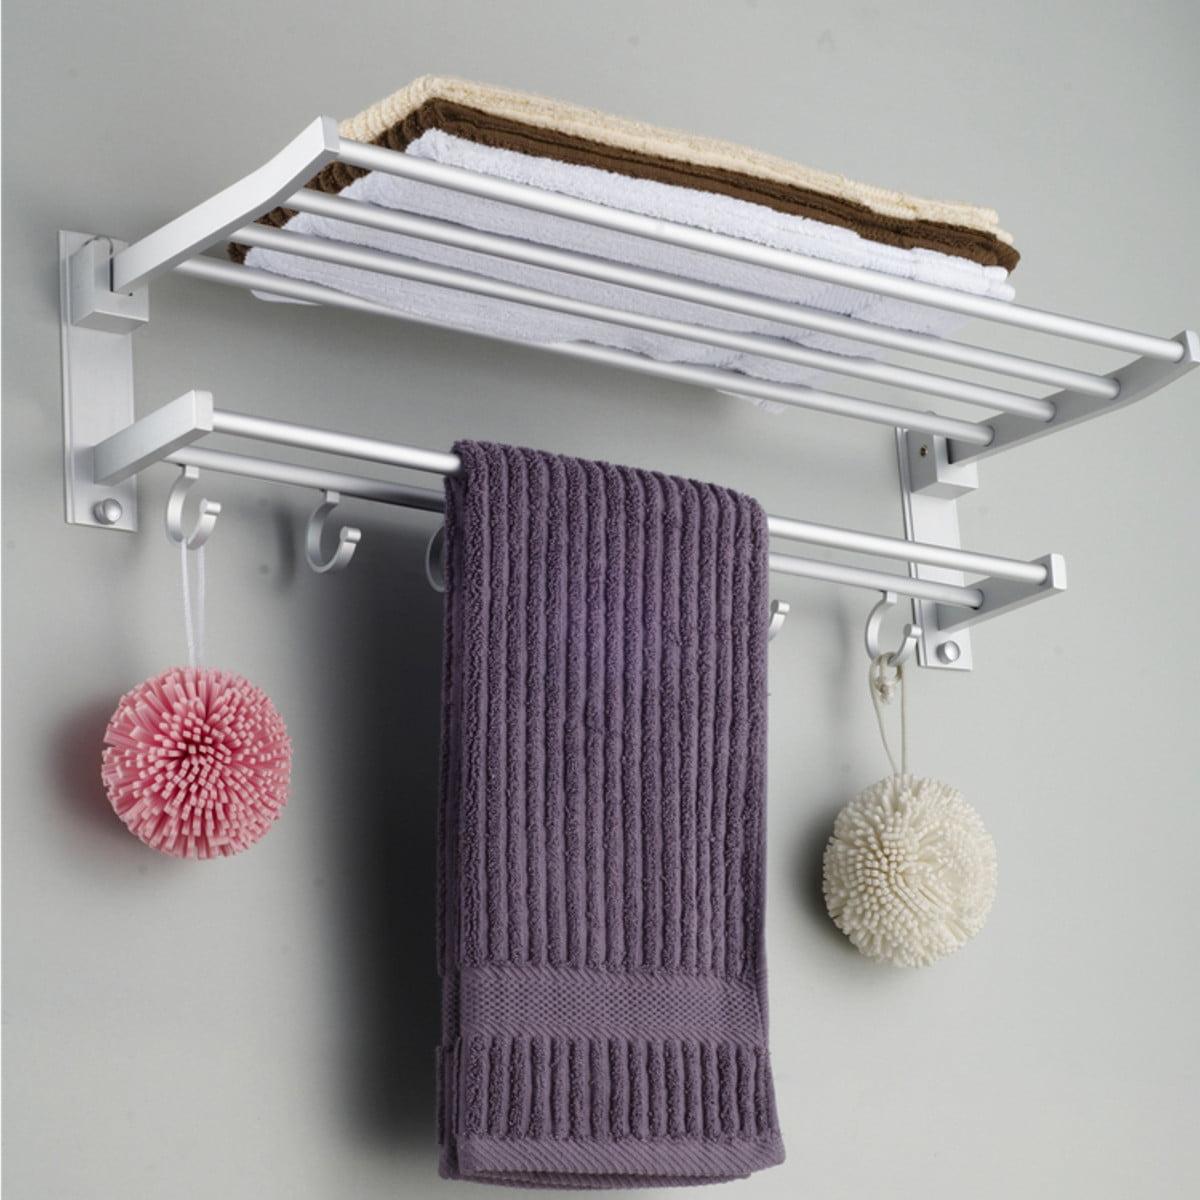 Modern Double Wall Foldable Mounted Bathroom Bath Towel Rail Holder Storage Rack Shelf